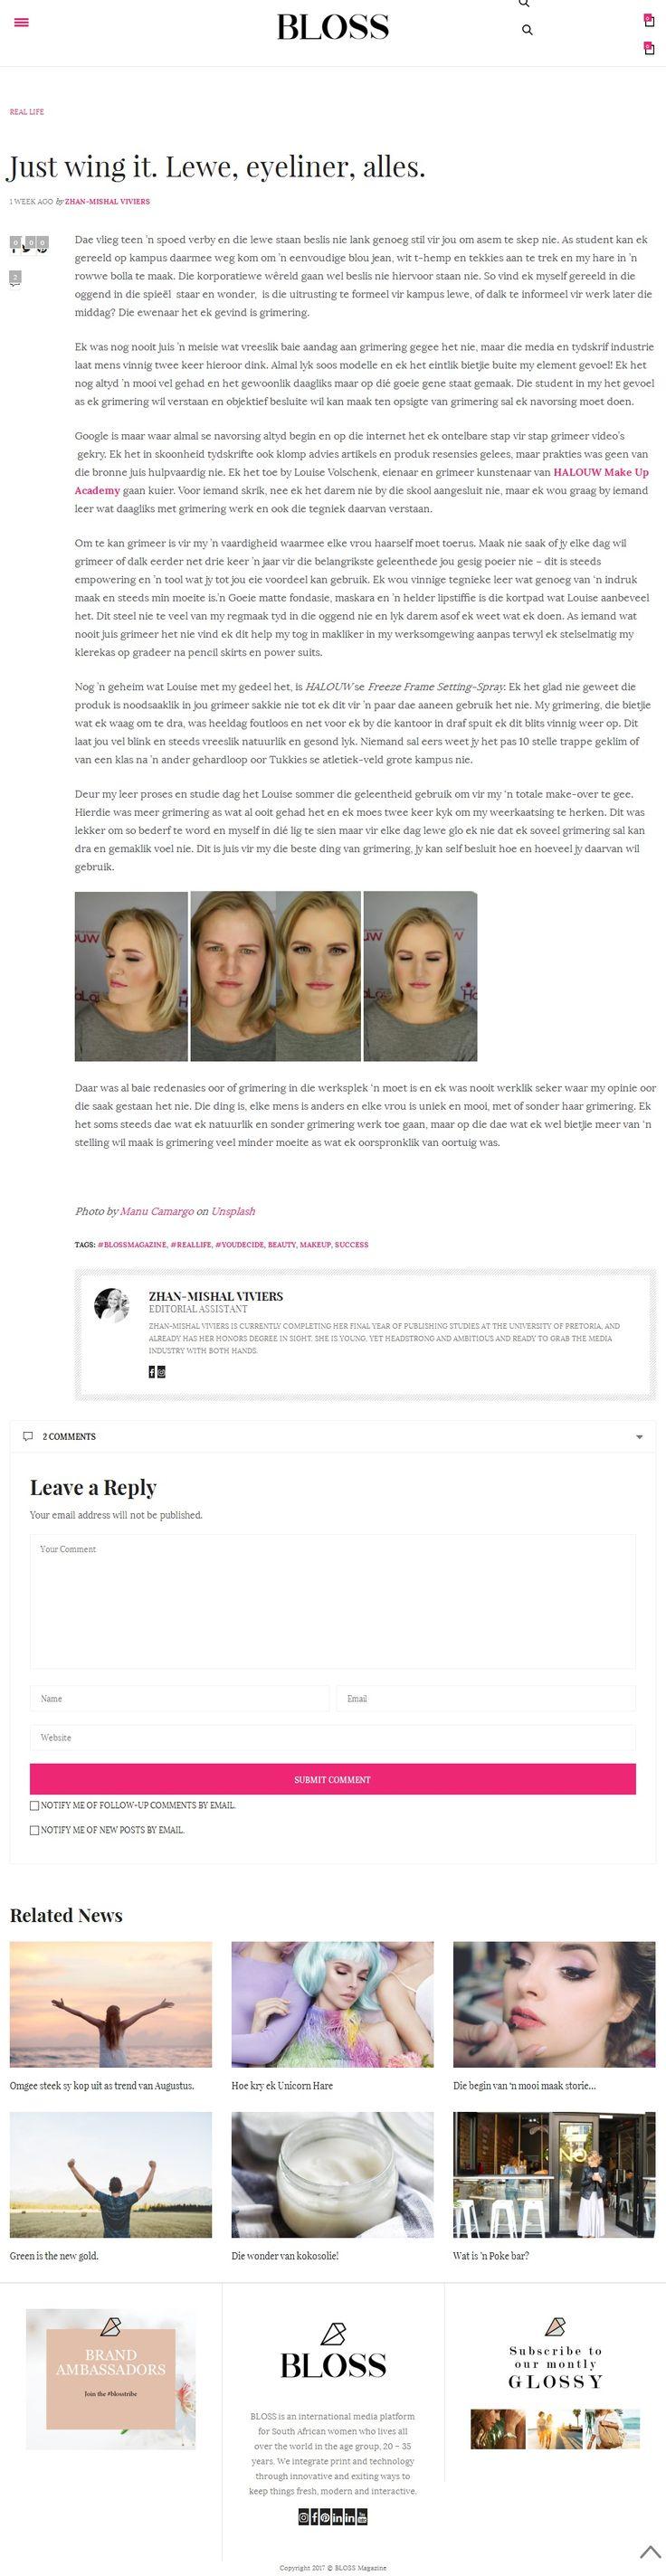 Halouw Make-up Academy featured in latest Afrikaans Mag- BLOSS. #makeup #article #makeuptips #halouw #makeupacademy